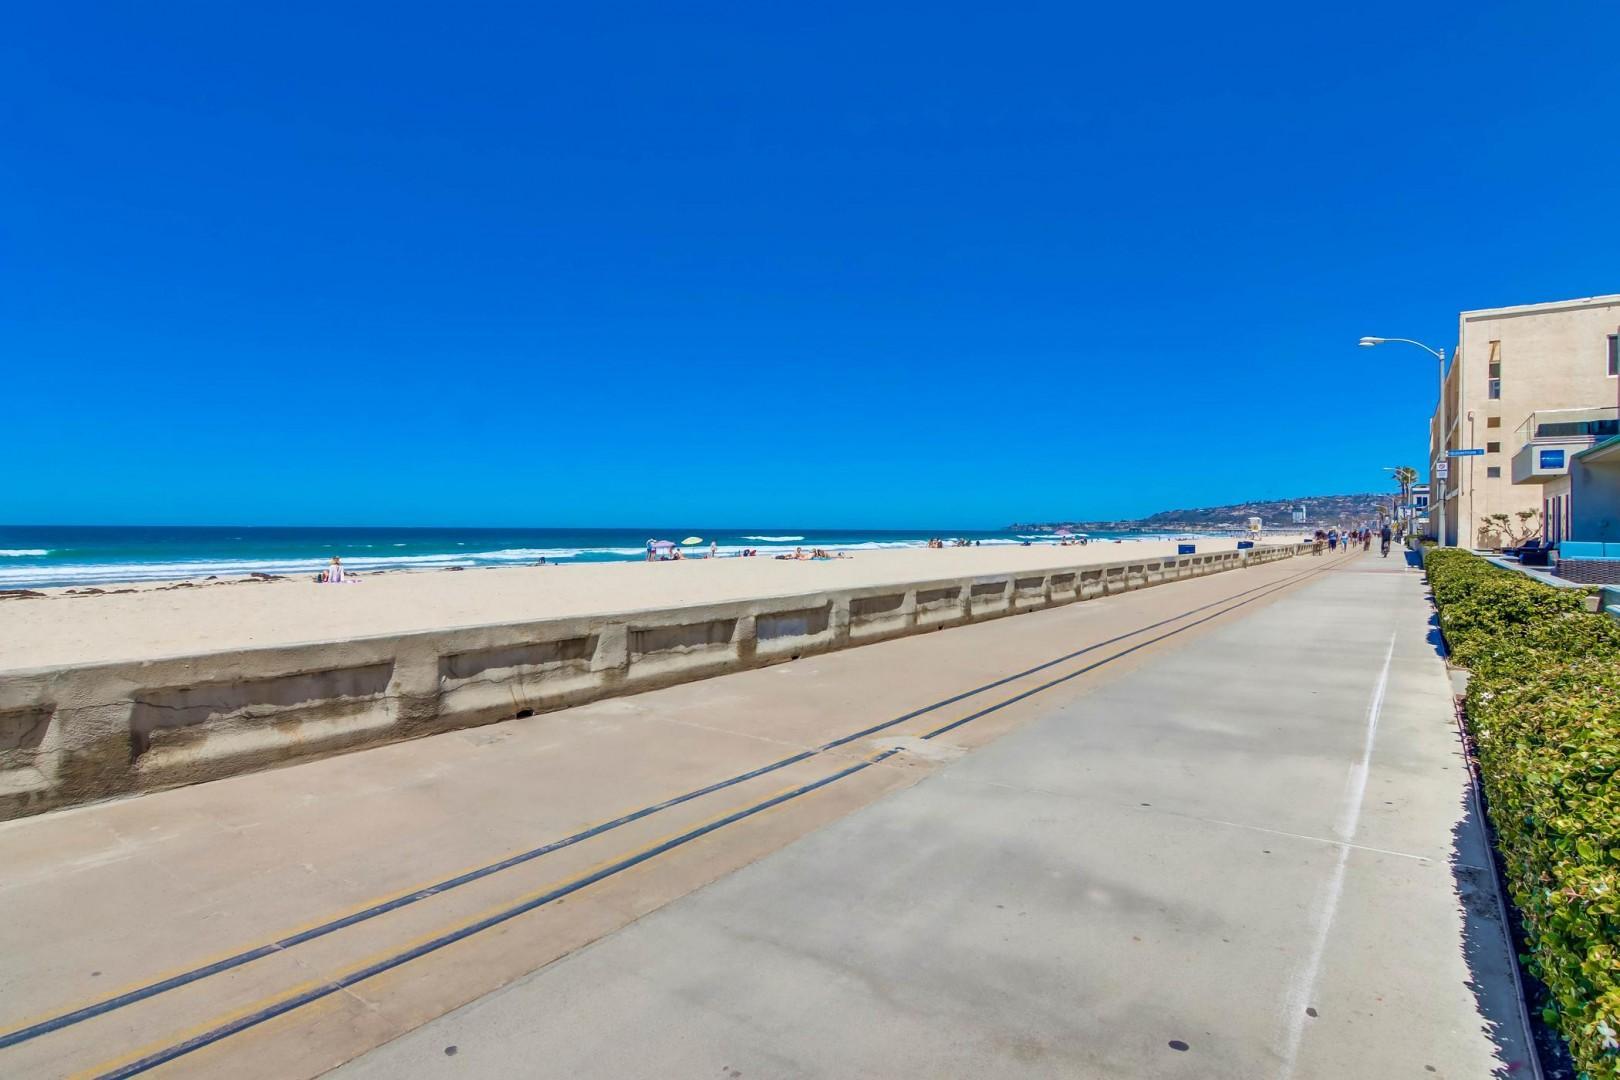 3721-strandway-2-062_2100x1400